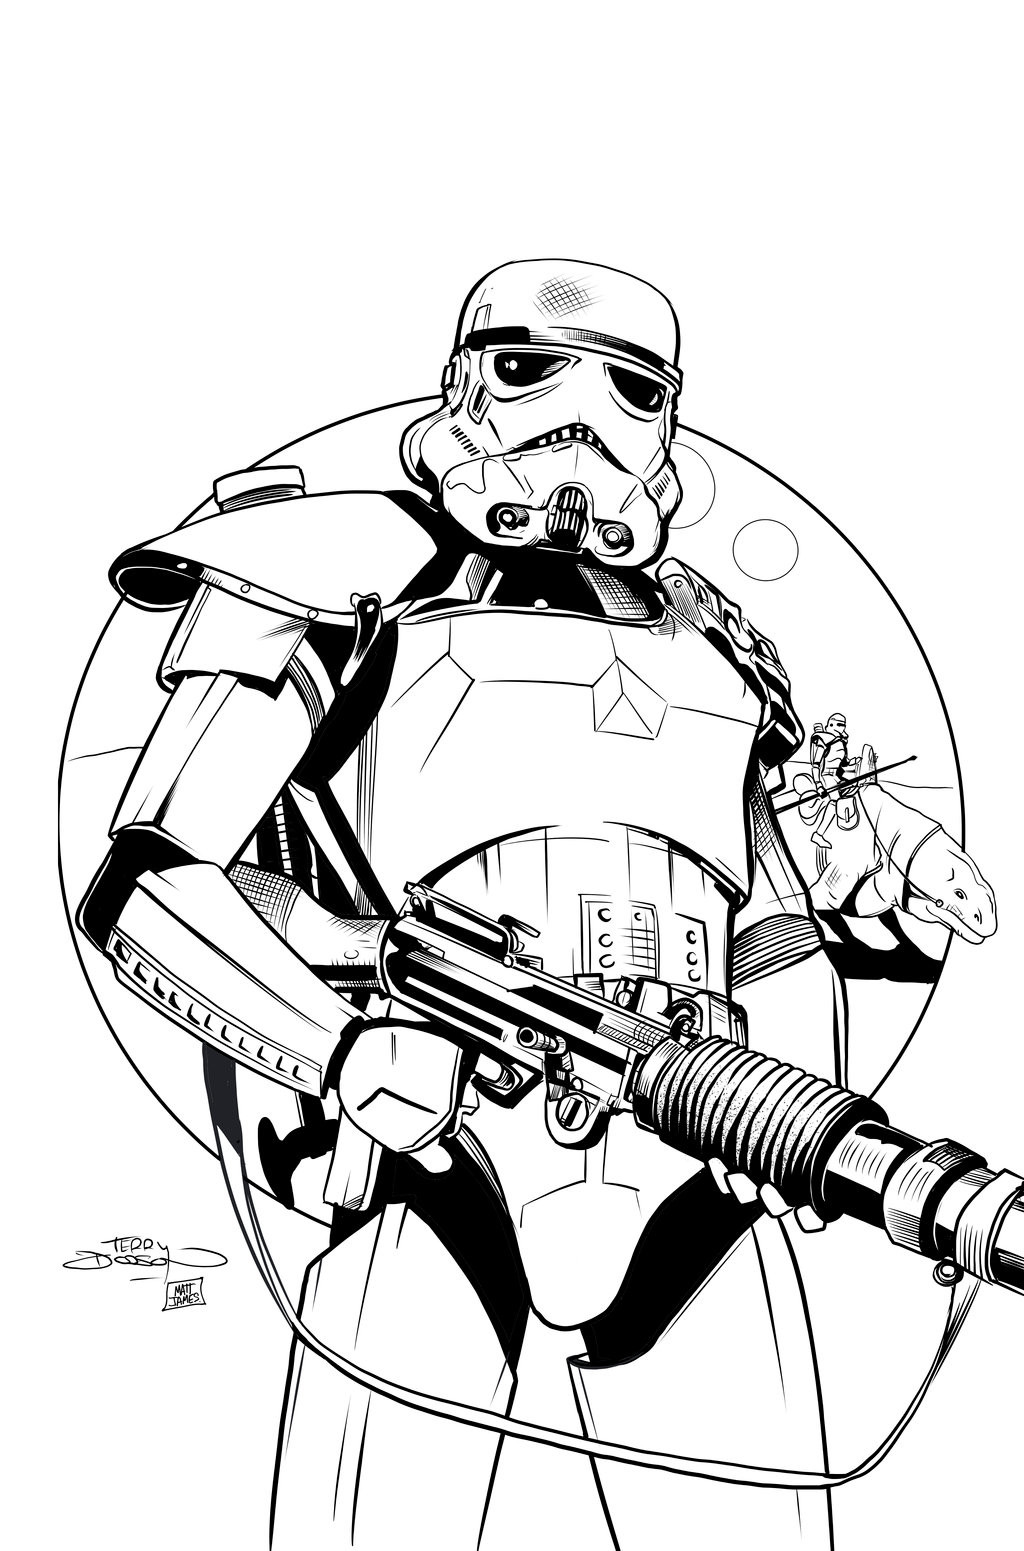 Matt james star wars issue 20 practice inks by snakebitartstudio db02xfy